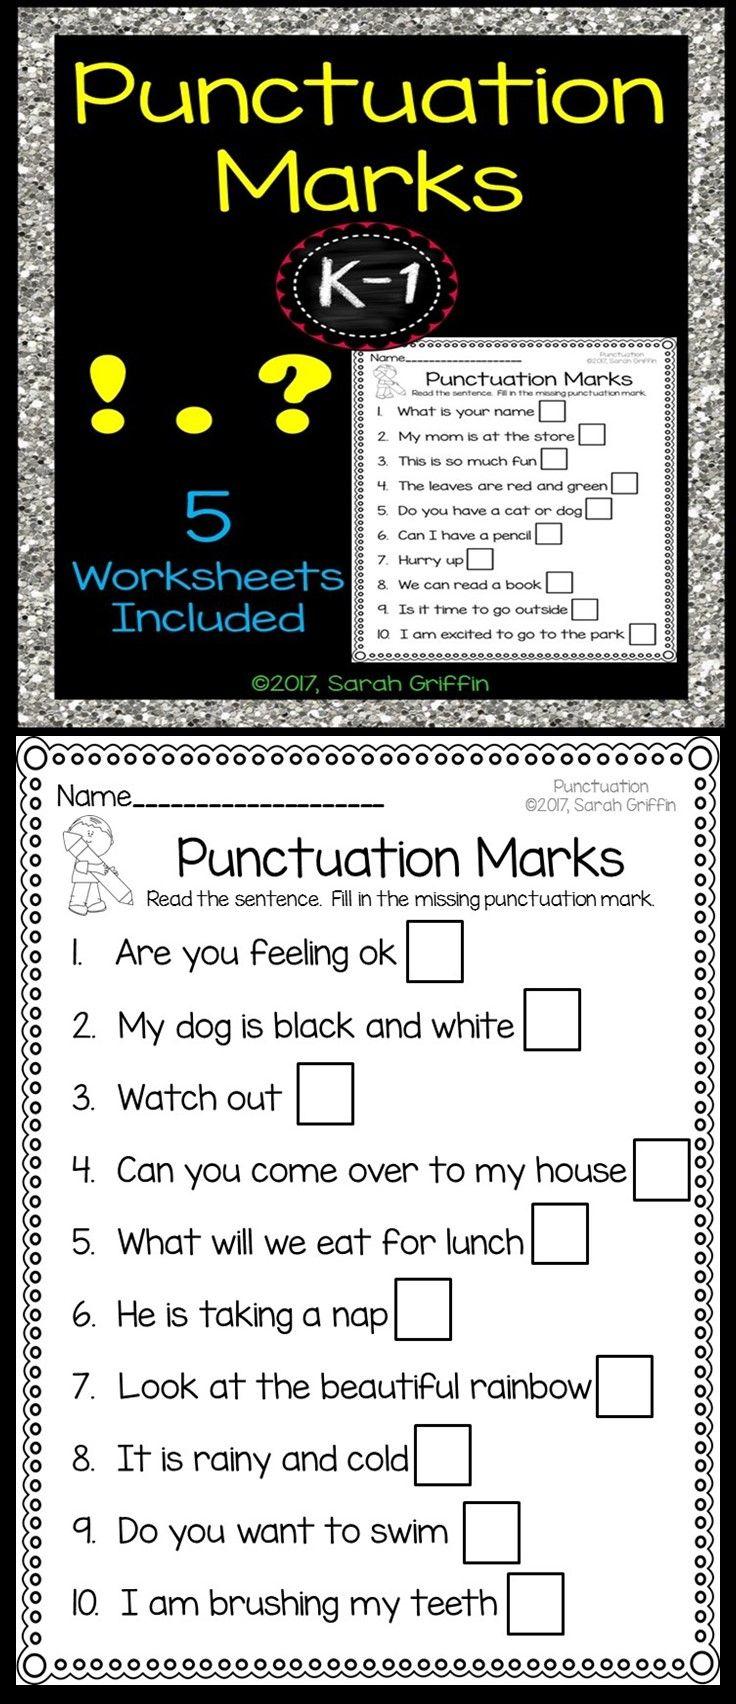 medium resolution of 9 Best Ending Punctuation Worksheets images on Best Worksheets Collection